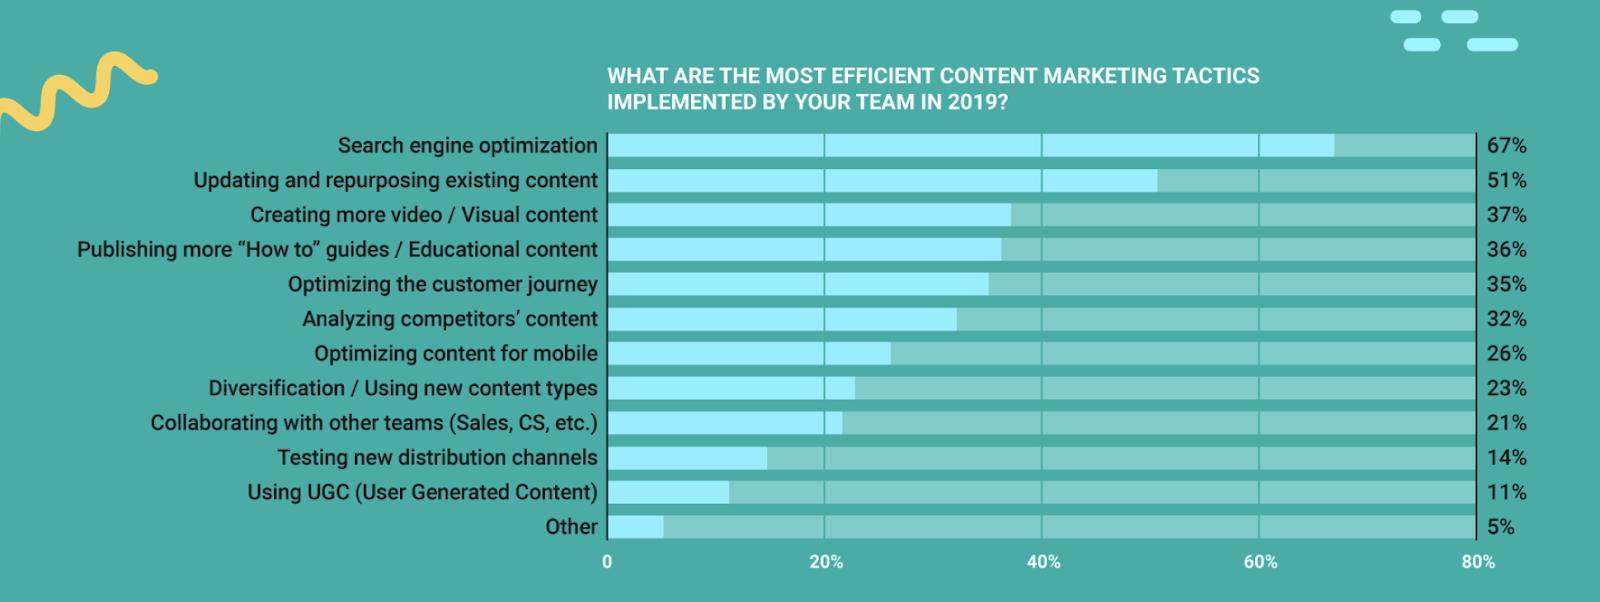 Blog Content Audit: Best Content Marketing Tactics